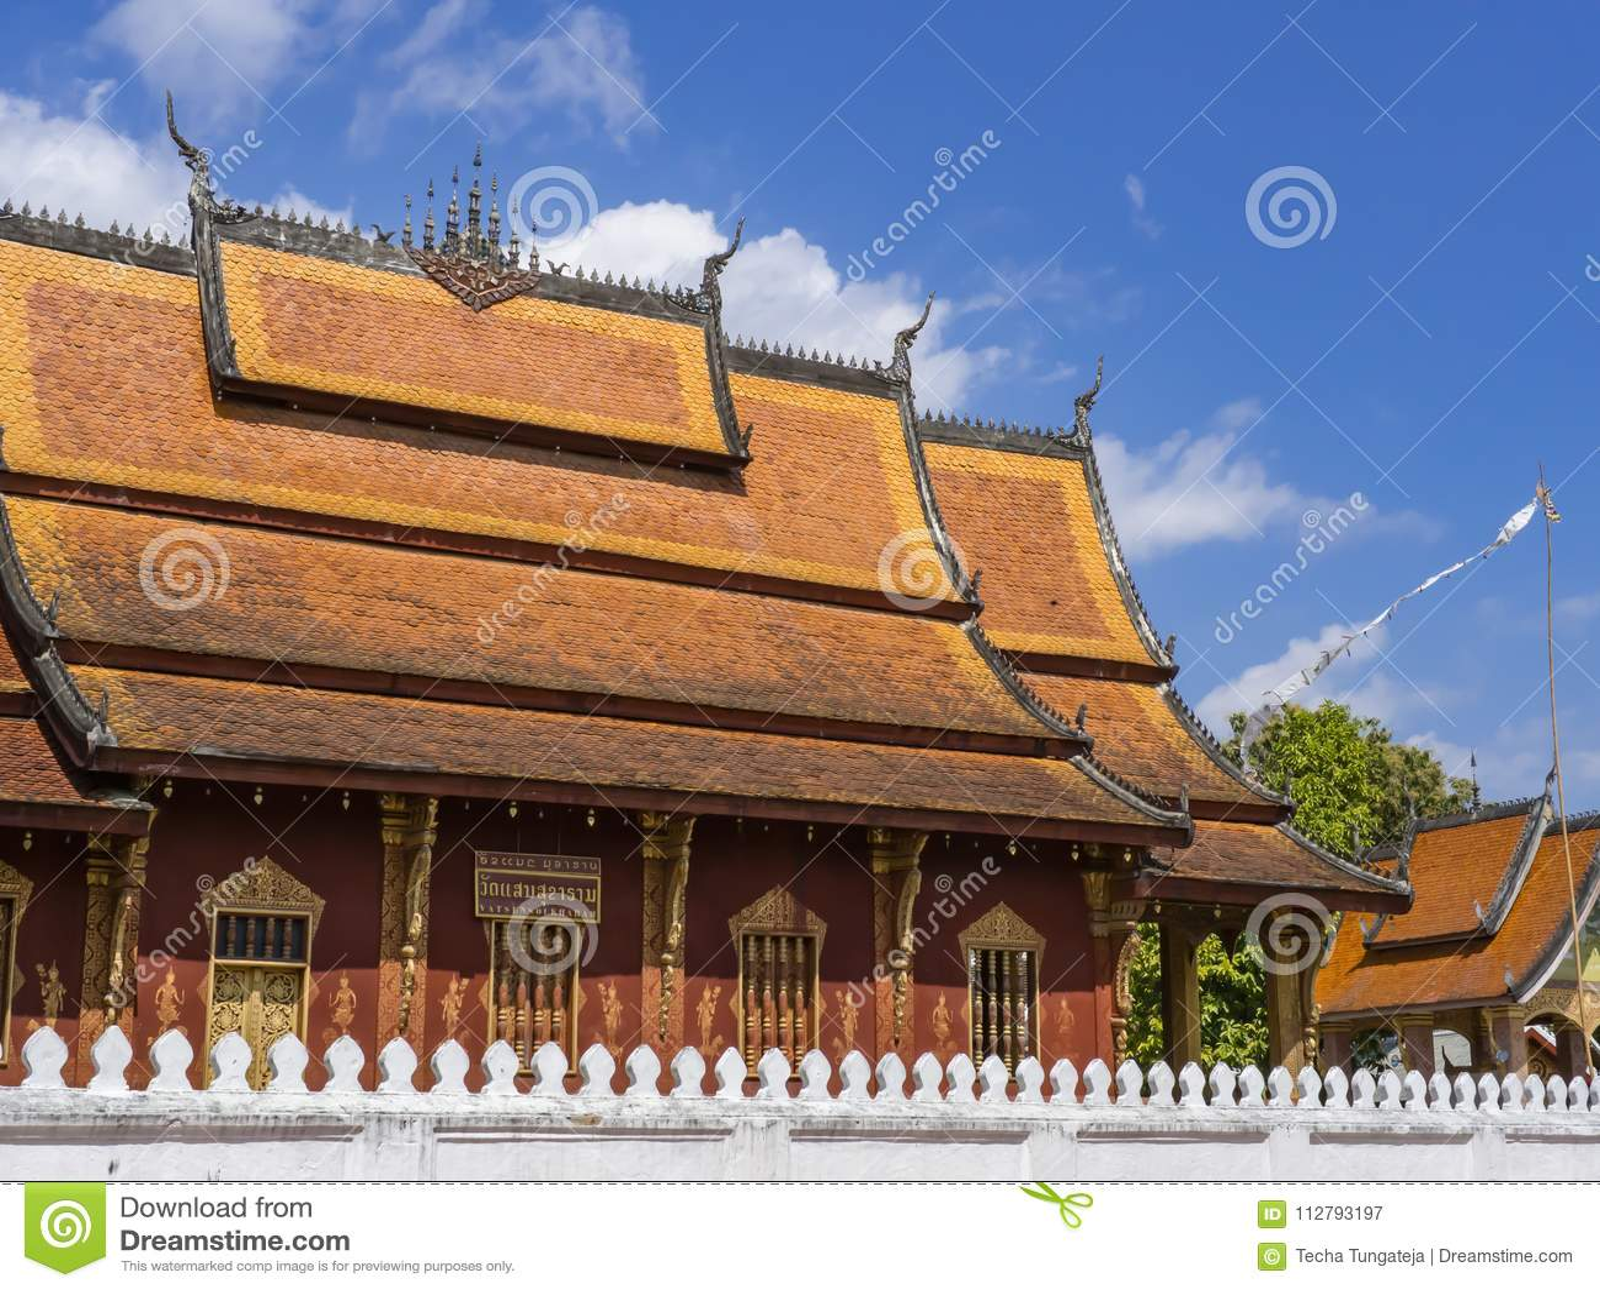 Wat Sen Soukaram Tradução na etiqueta: Senador Soukaram Temple